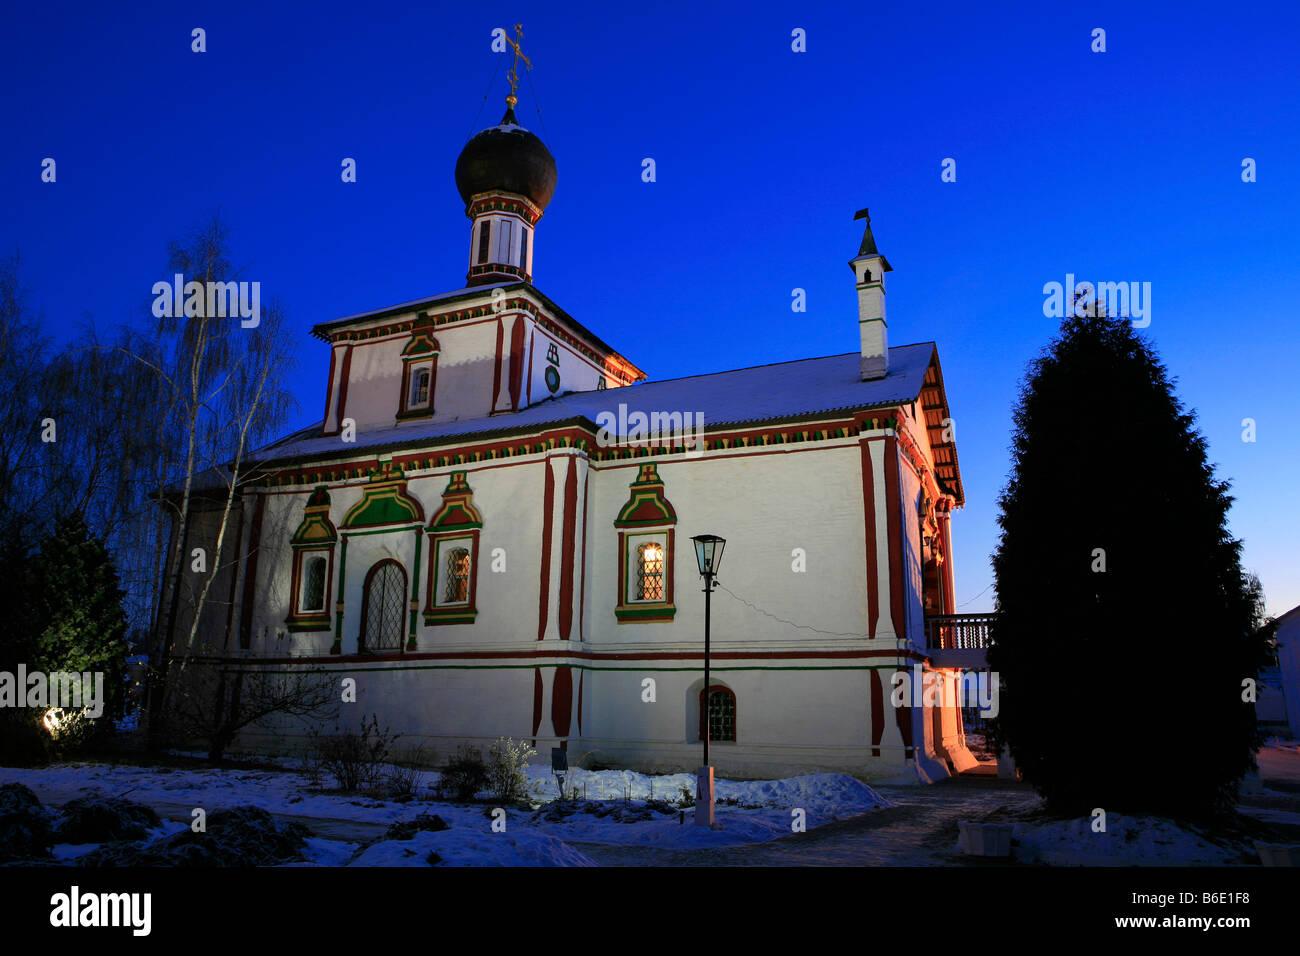 Sights of Kolomna. Monasteries and churches of Kolomna 40